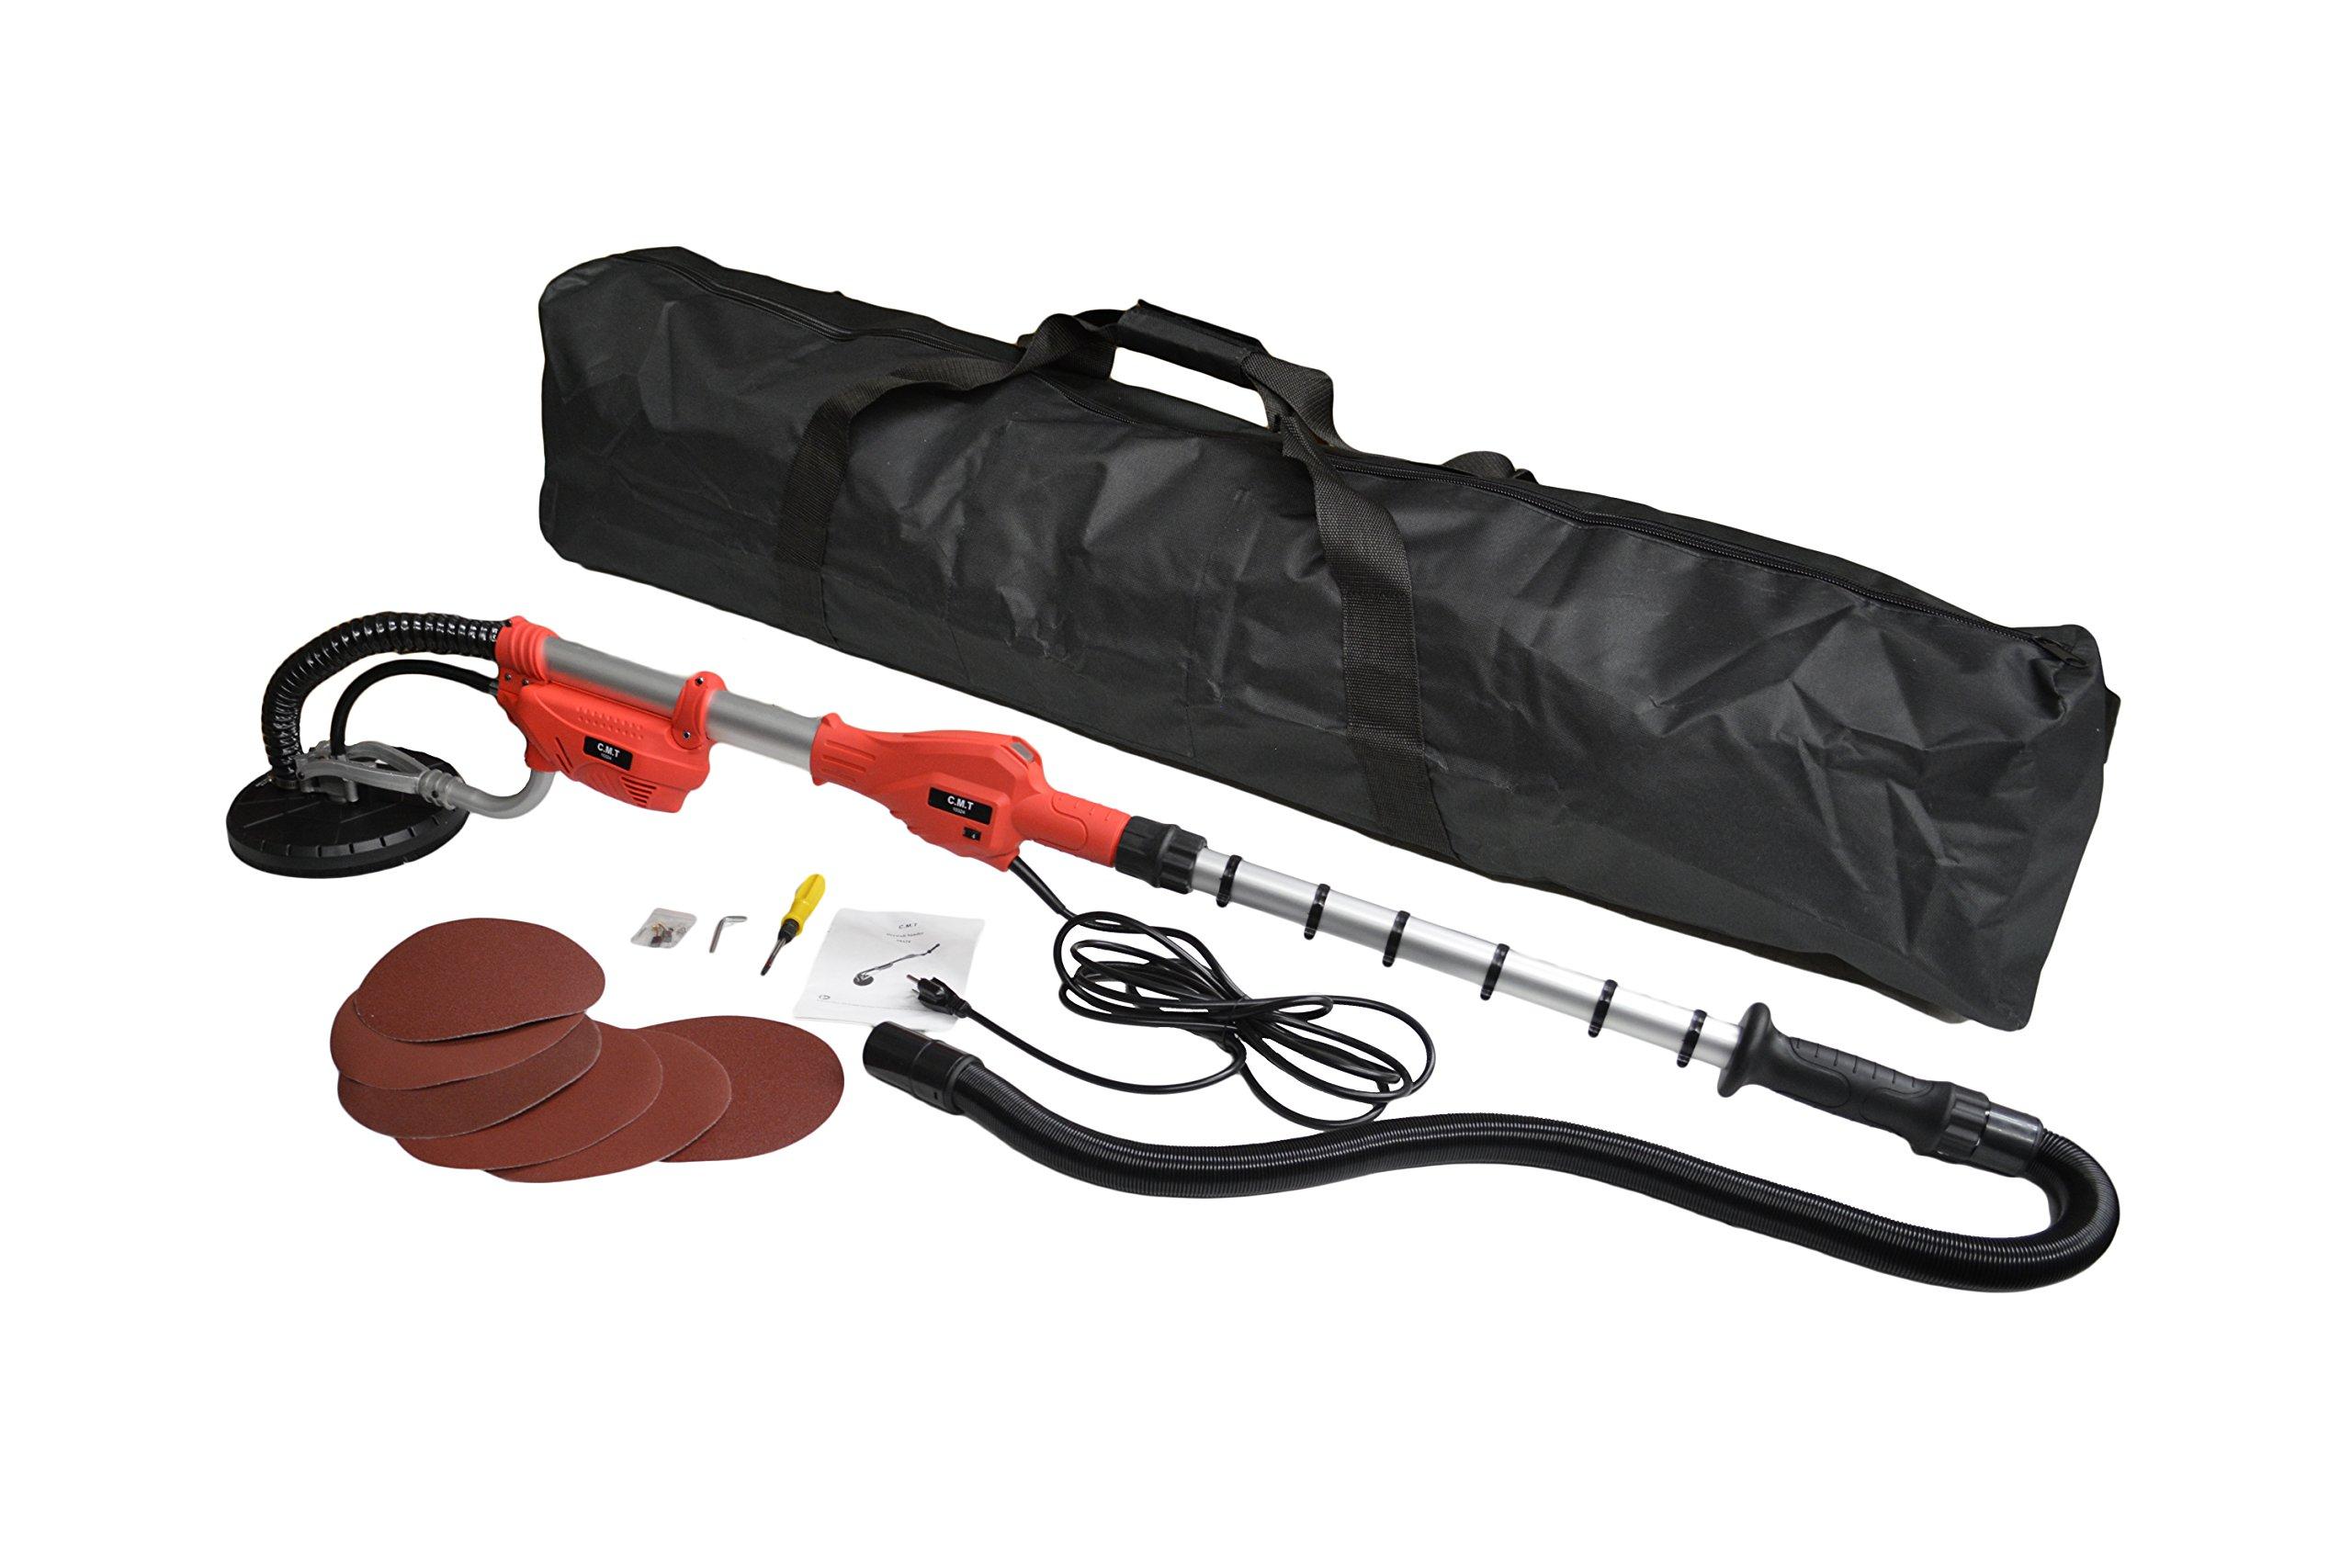 Extendable Drywall Sander 800 Watt Professional Grade Dry Wall Sander with Carry Bag (Extends 43